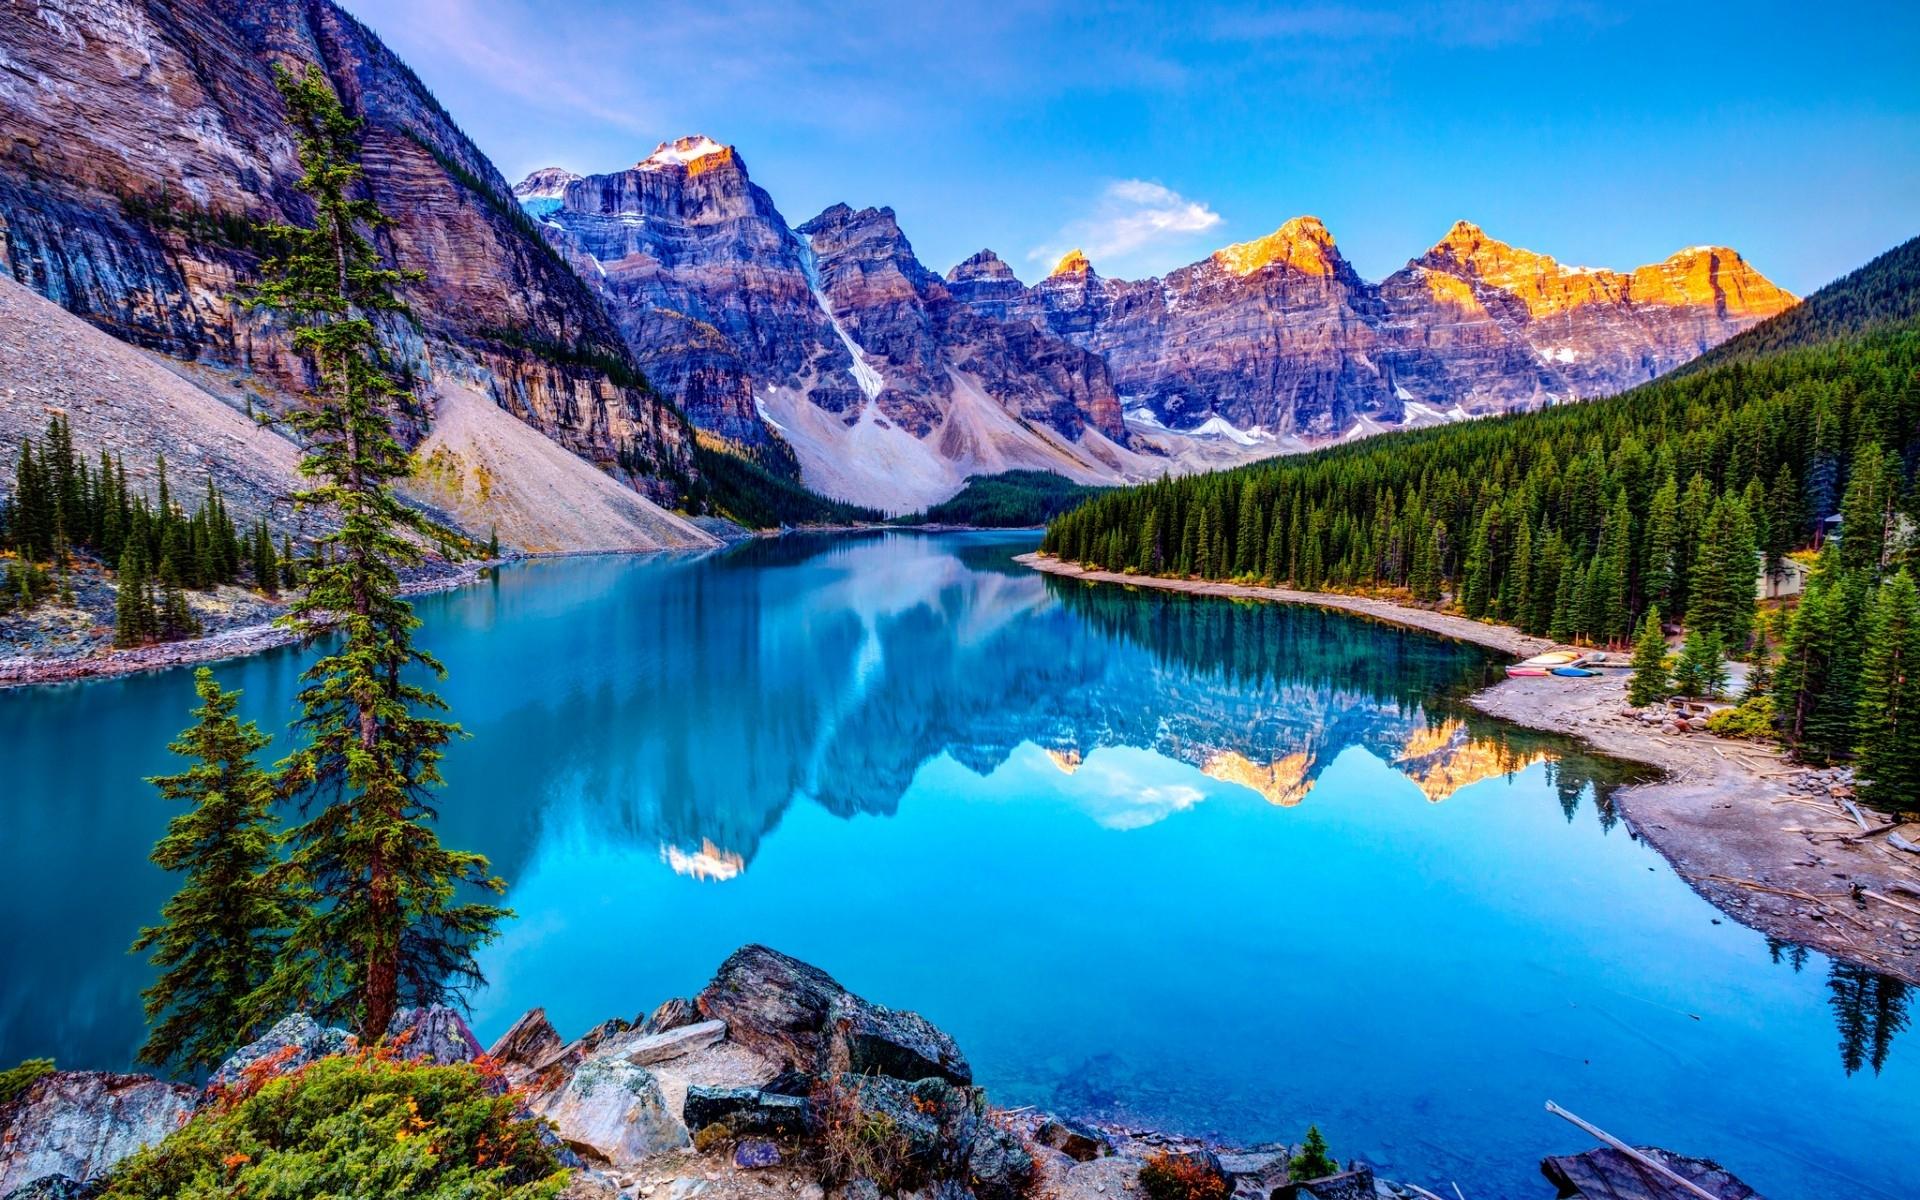 landscape of lake and mountains hd desktop wallpaper hd desktop